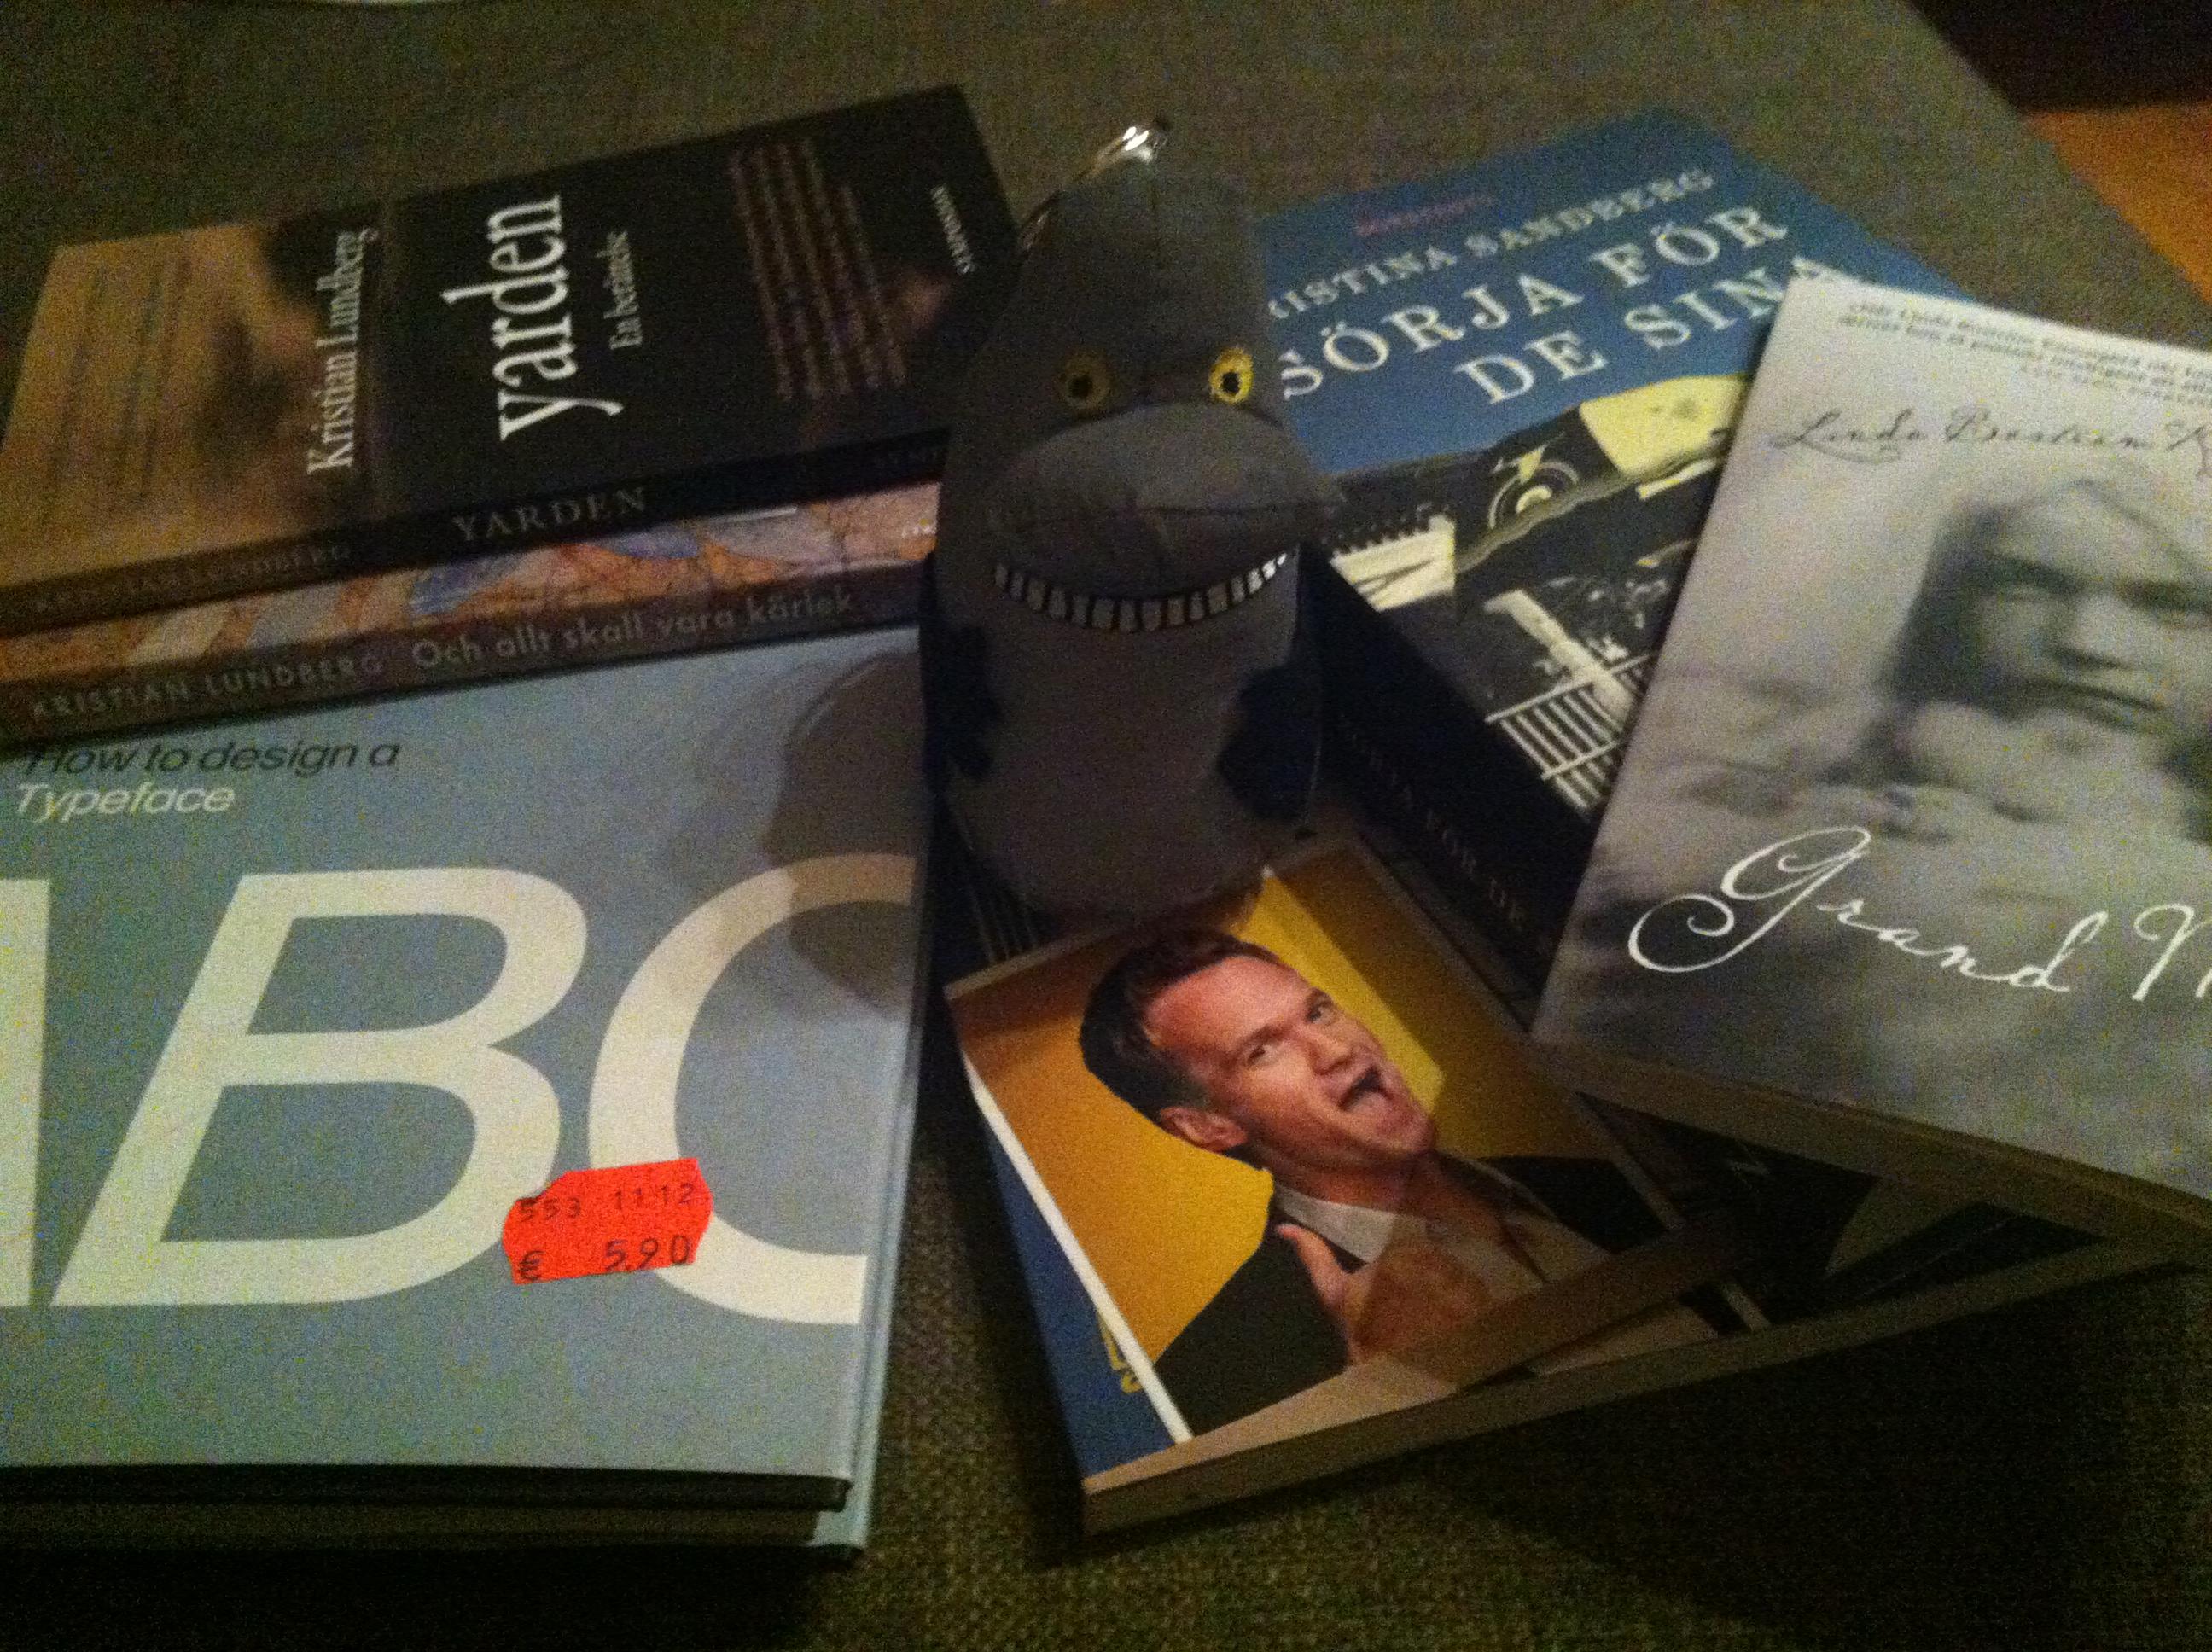 kjøpt i akademiska bokhandeln